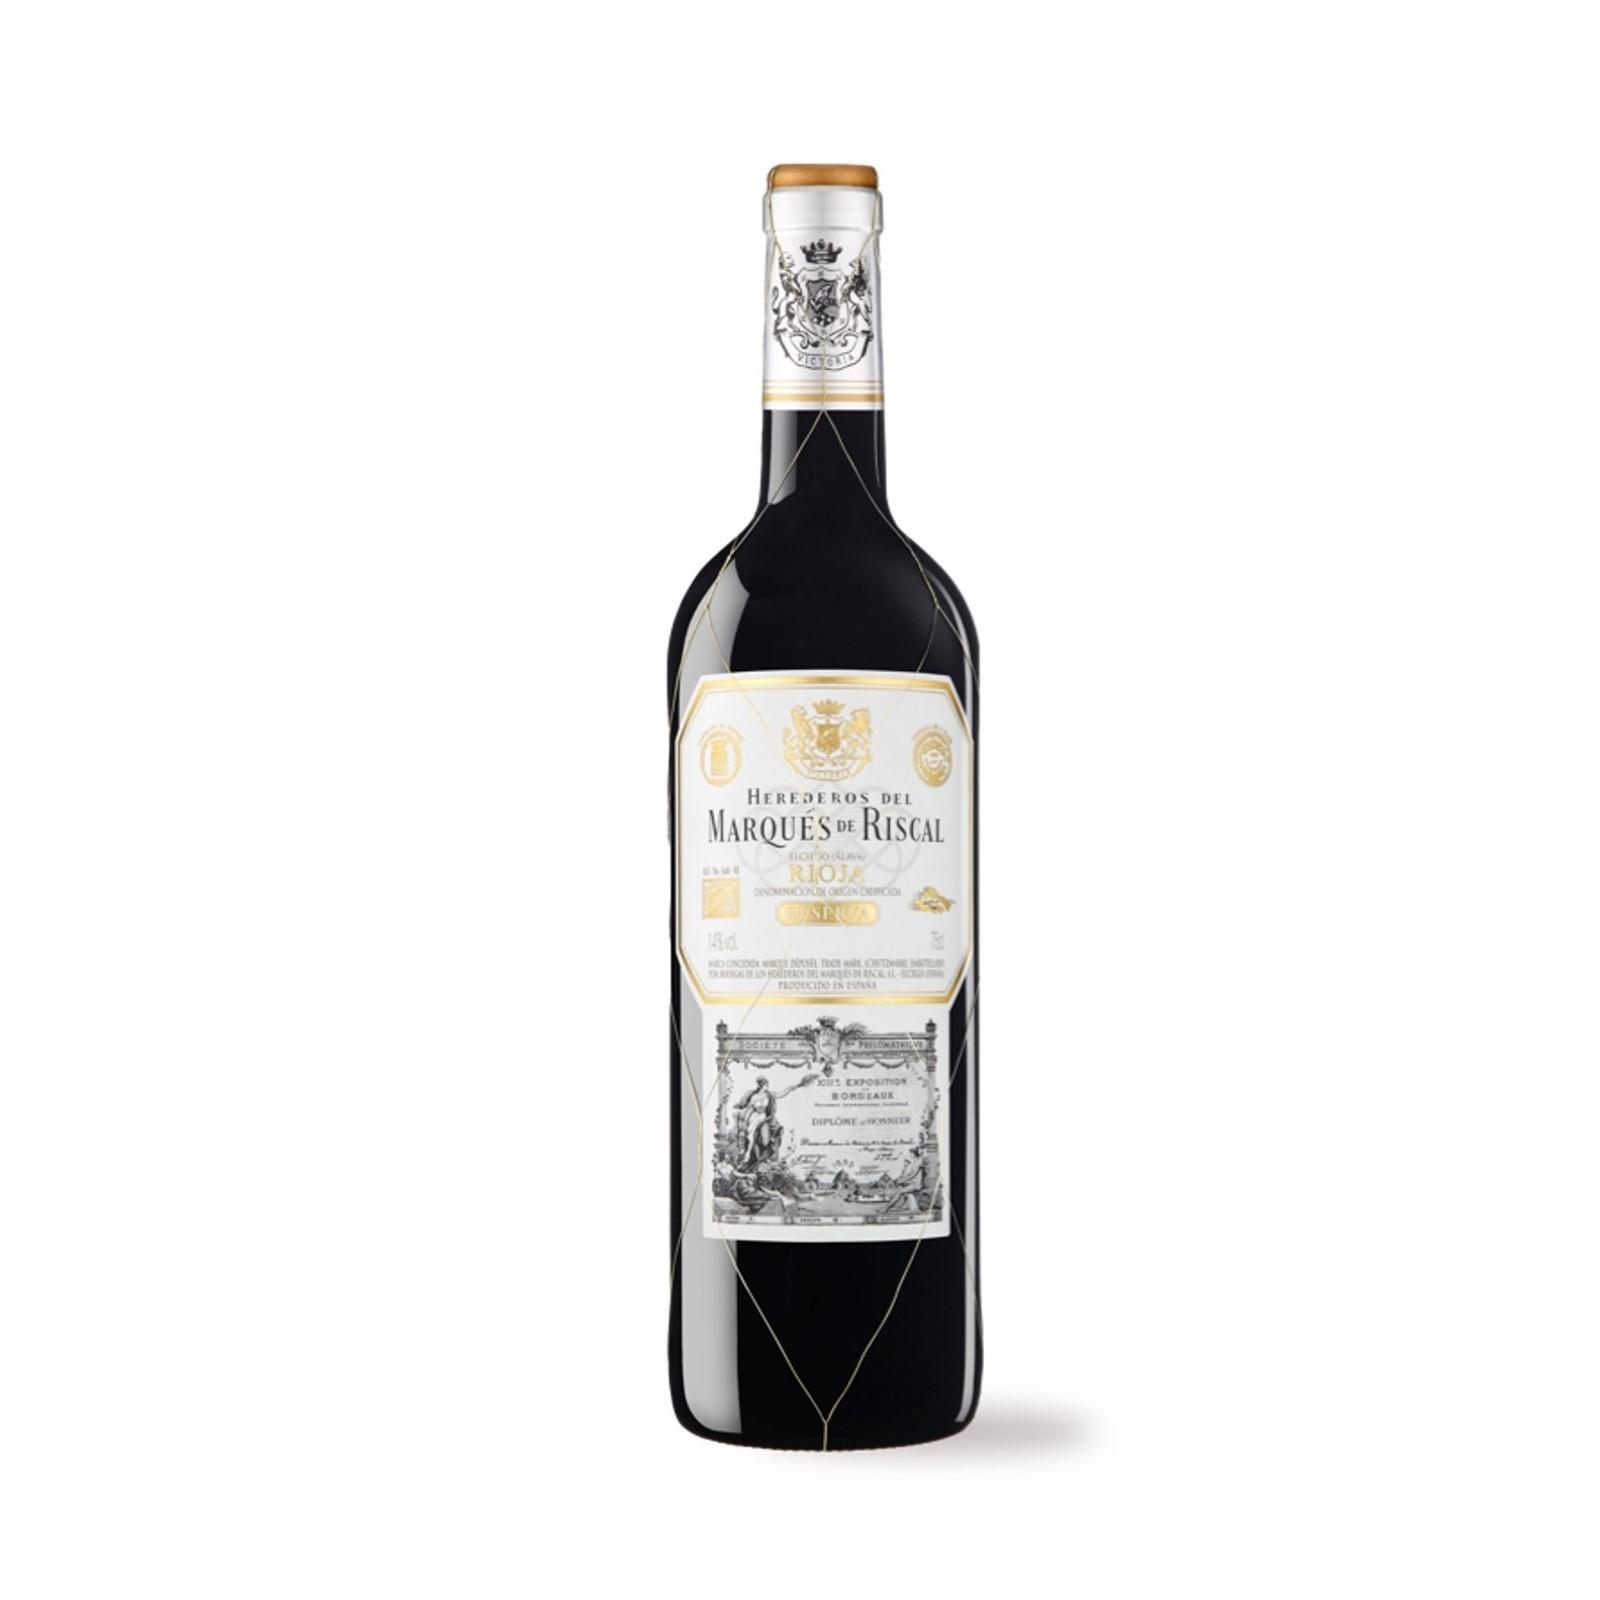 Marques de Riscal Reserva Rioja